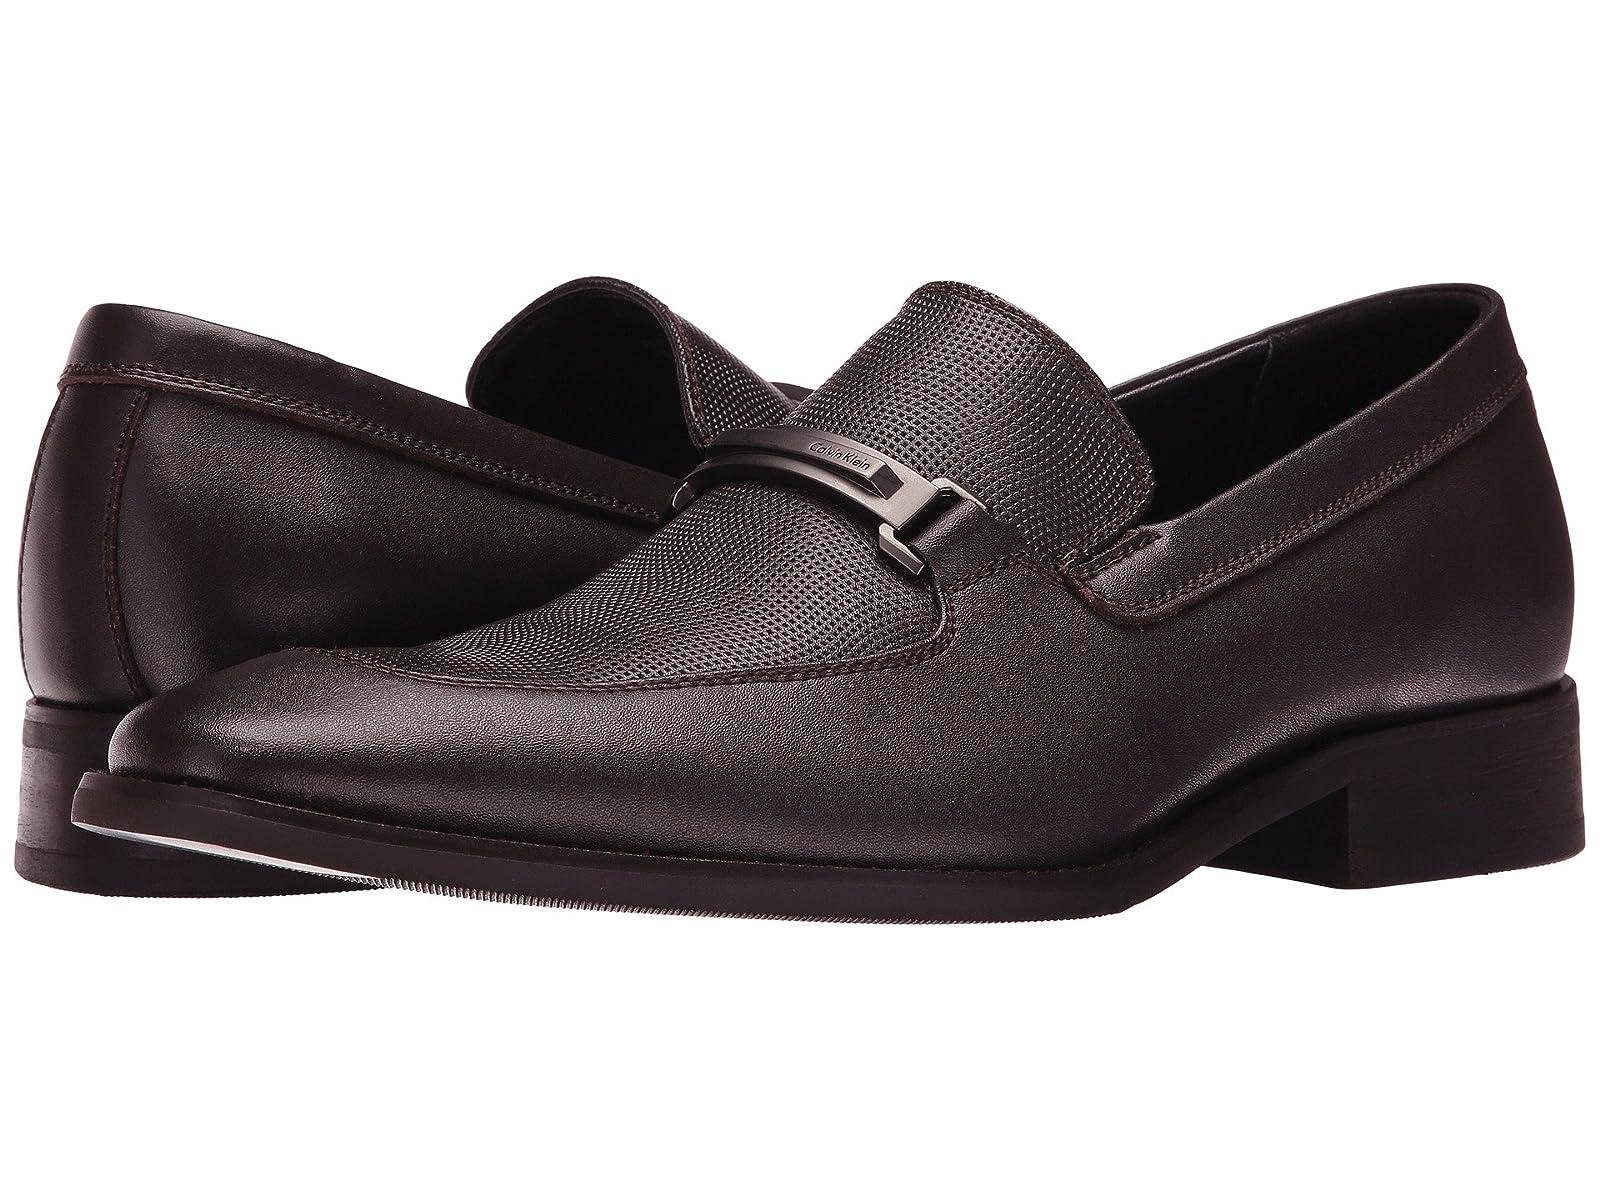 Calvin Klein RufusCheap and distinctive eye-catching shoes